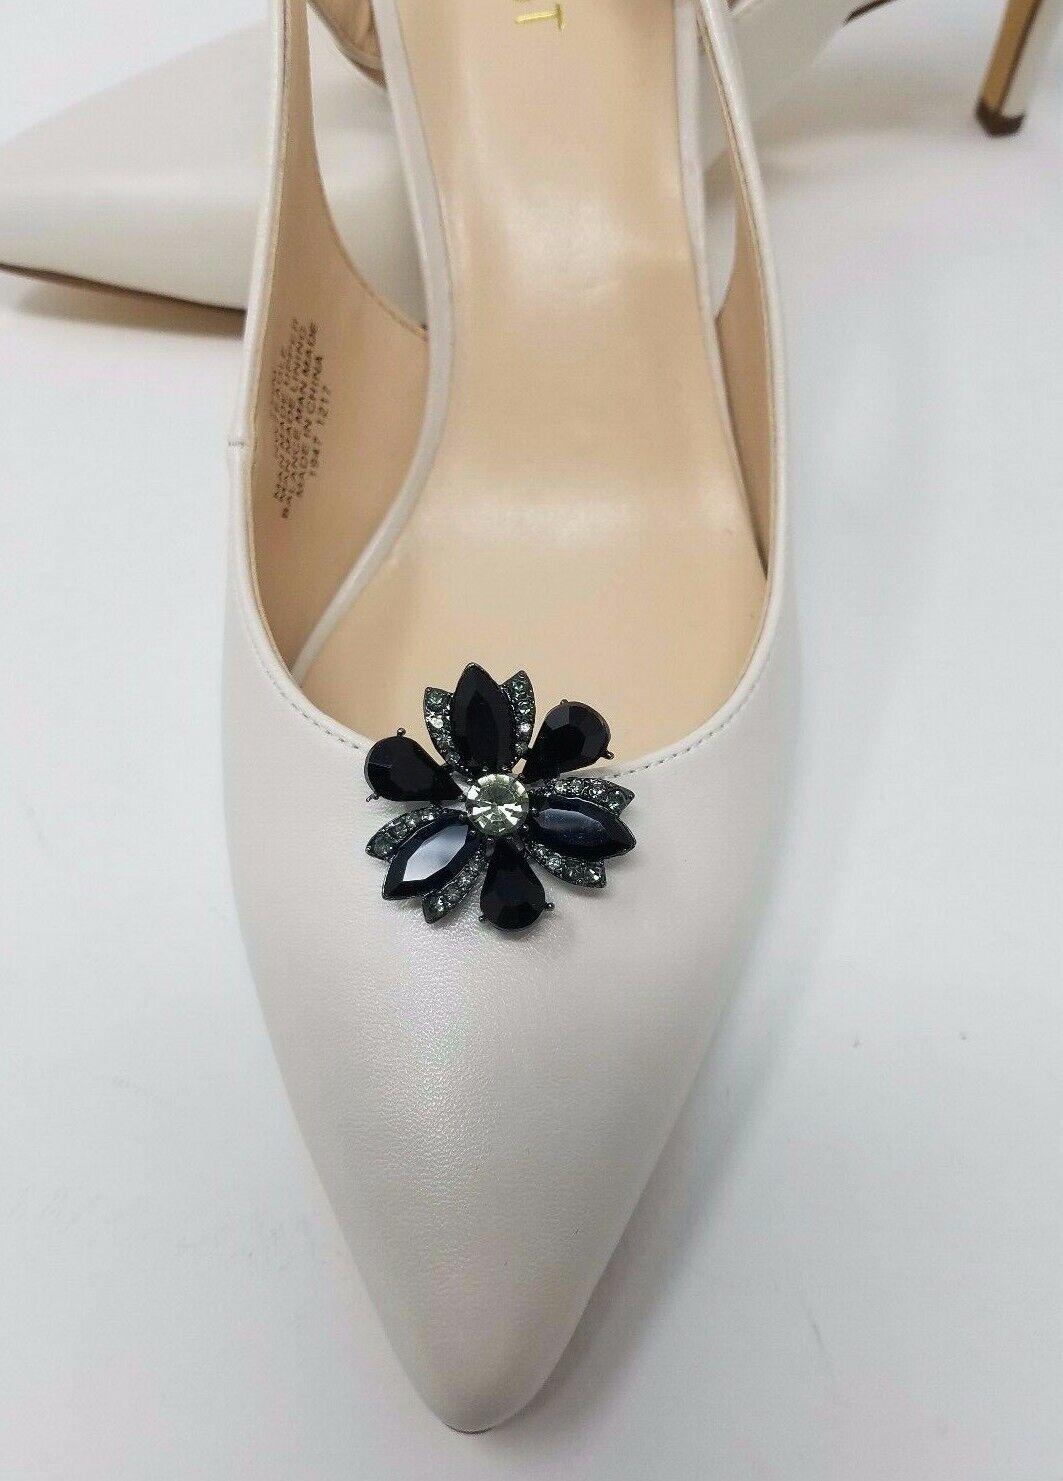 Flower Shoe Clips with Rhinestones 2pcs, Shoe Accessories